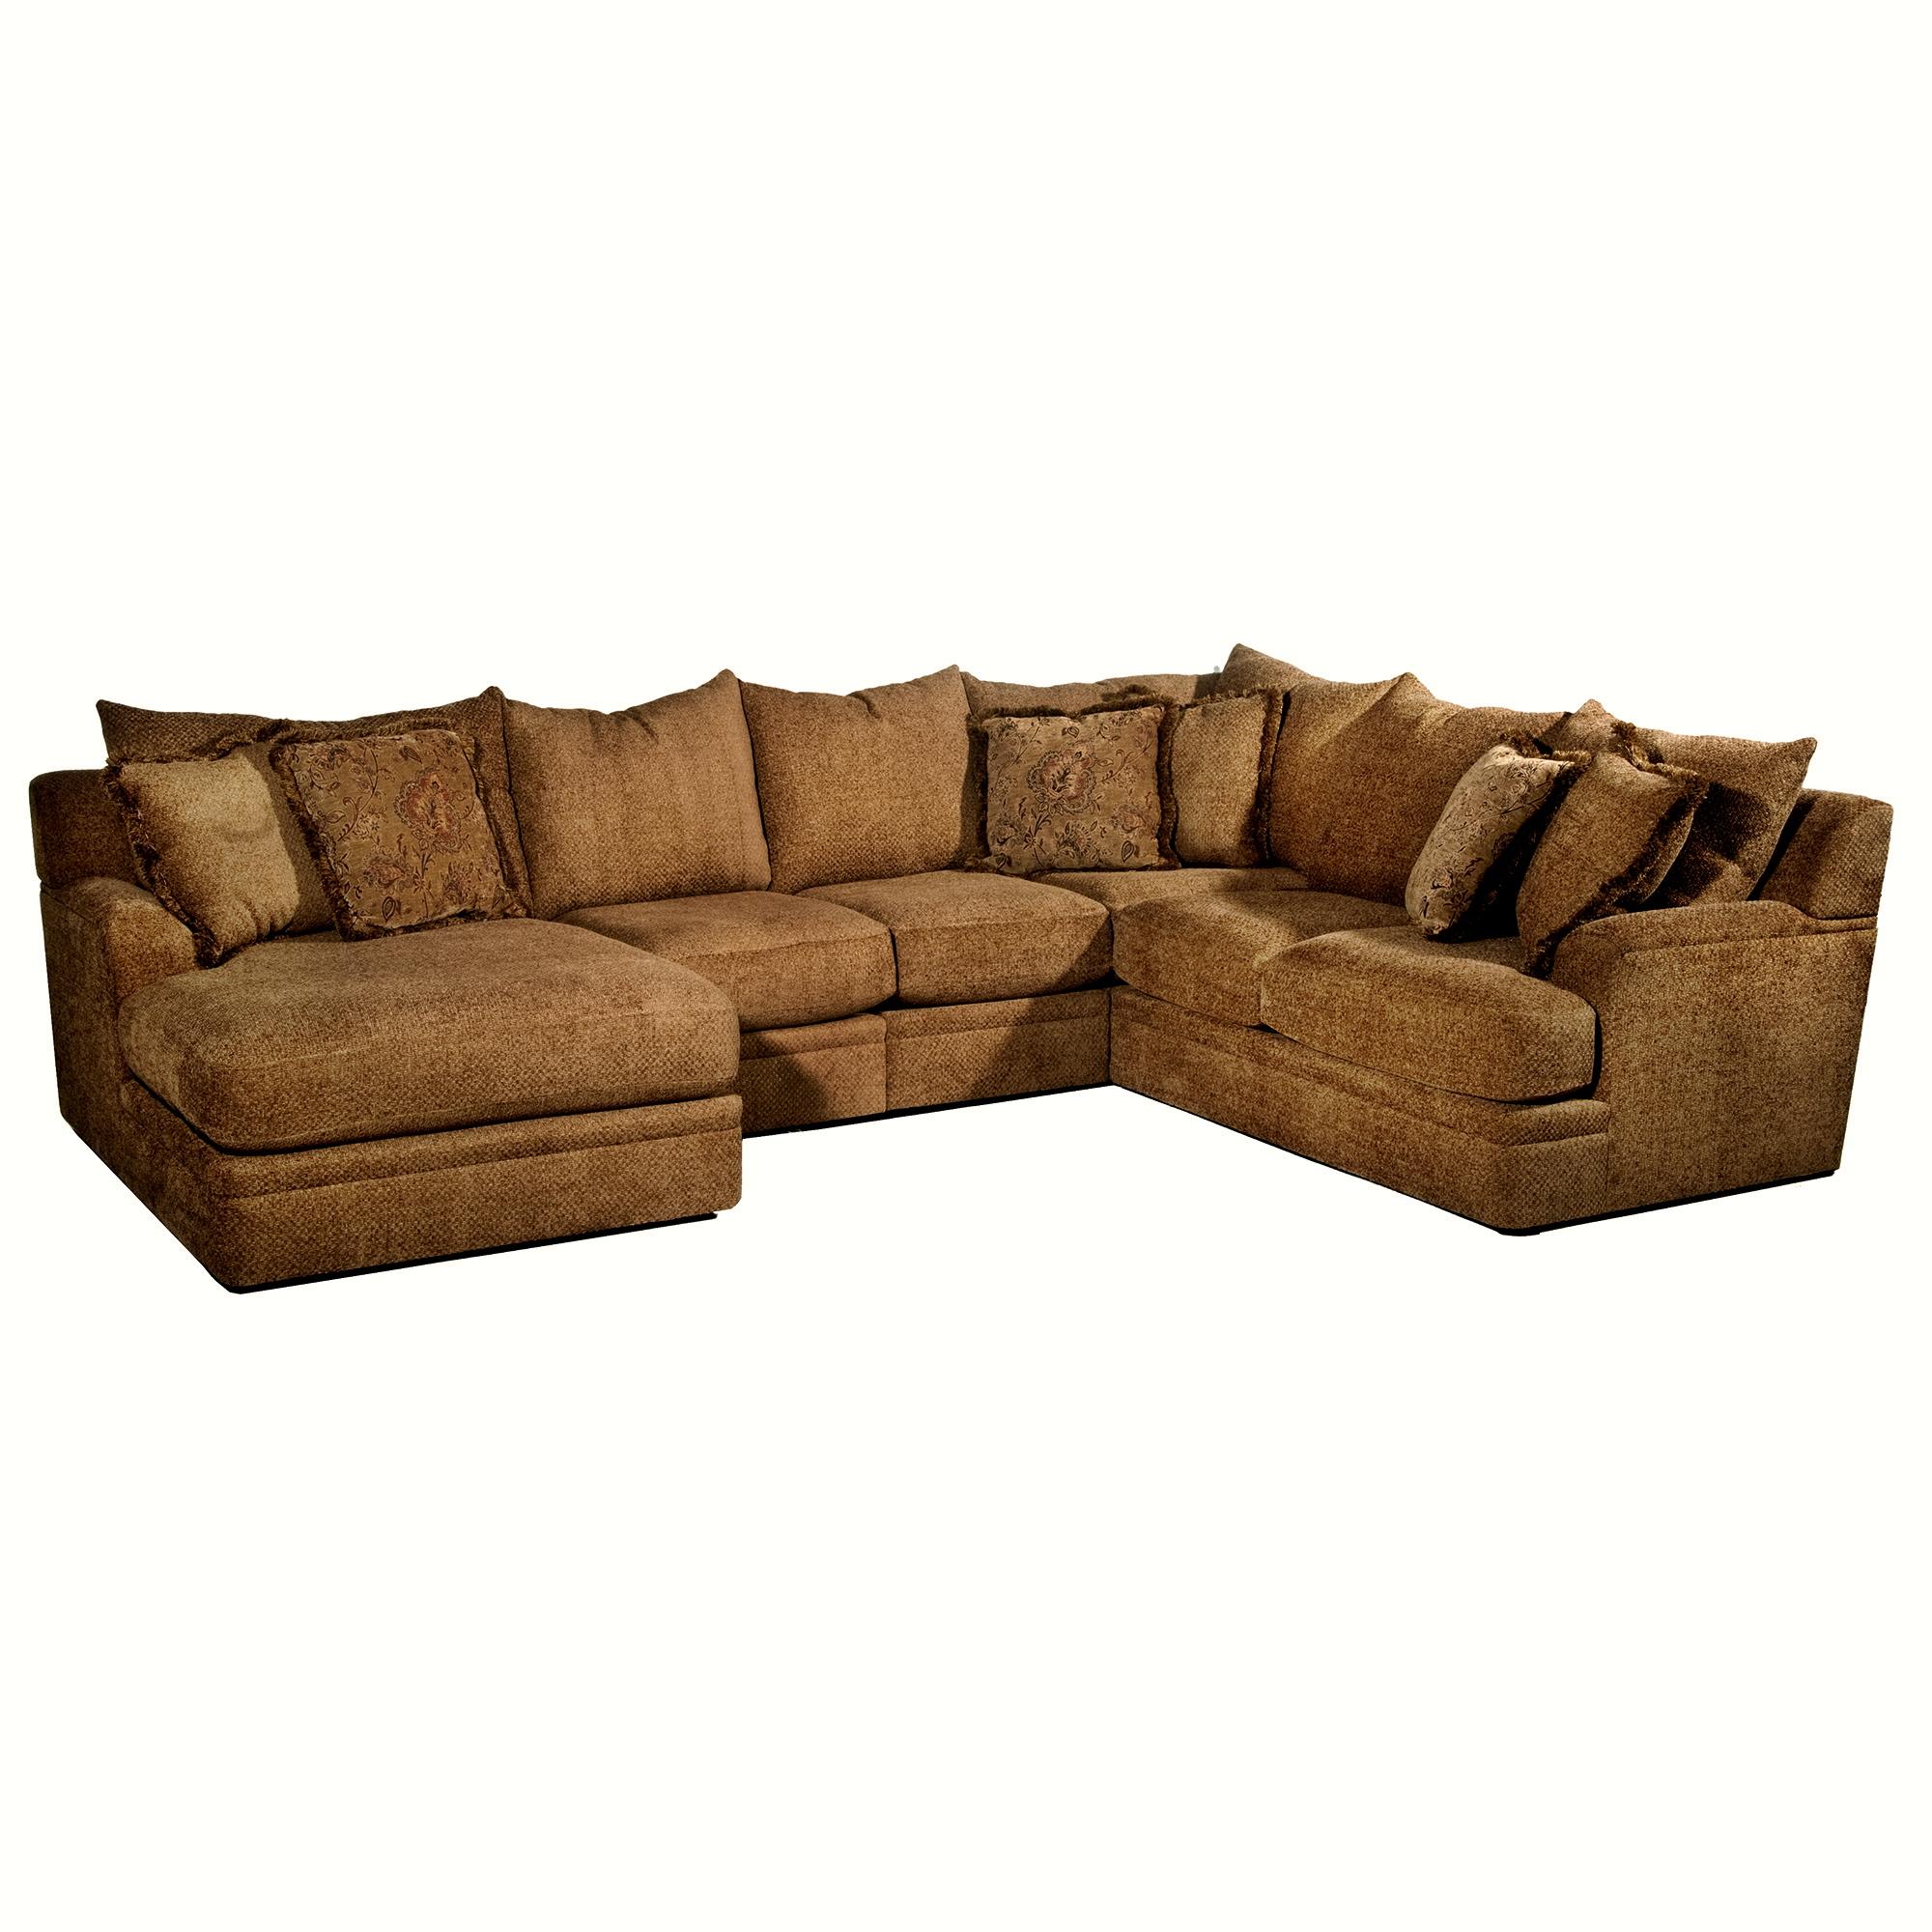 Shelbee Sectional Sofa